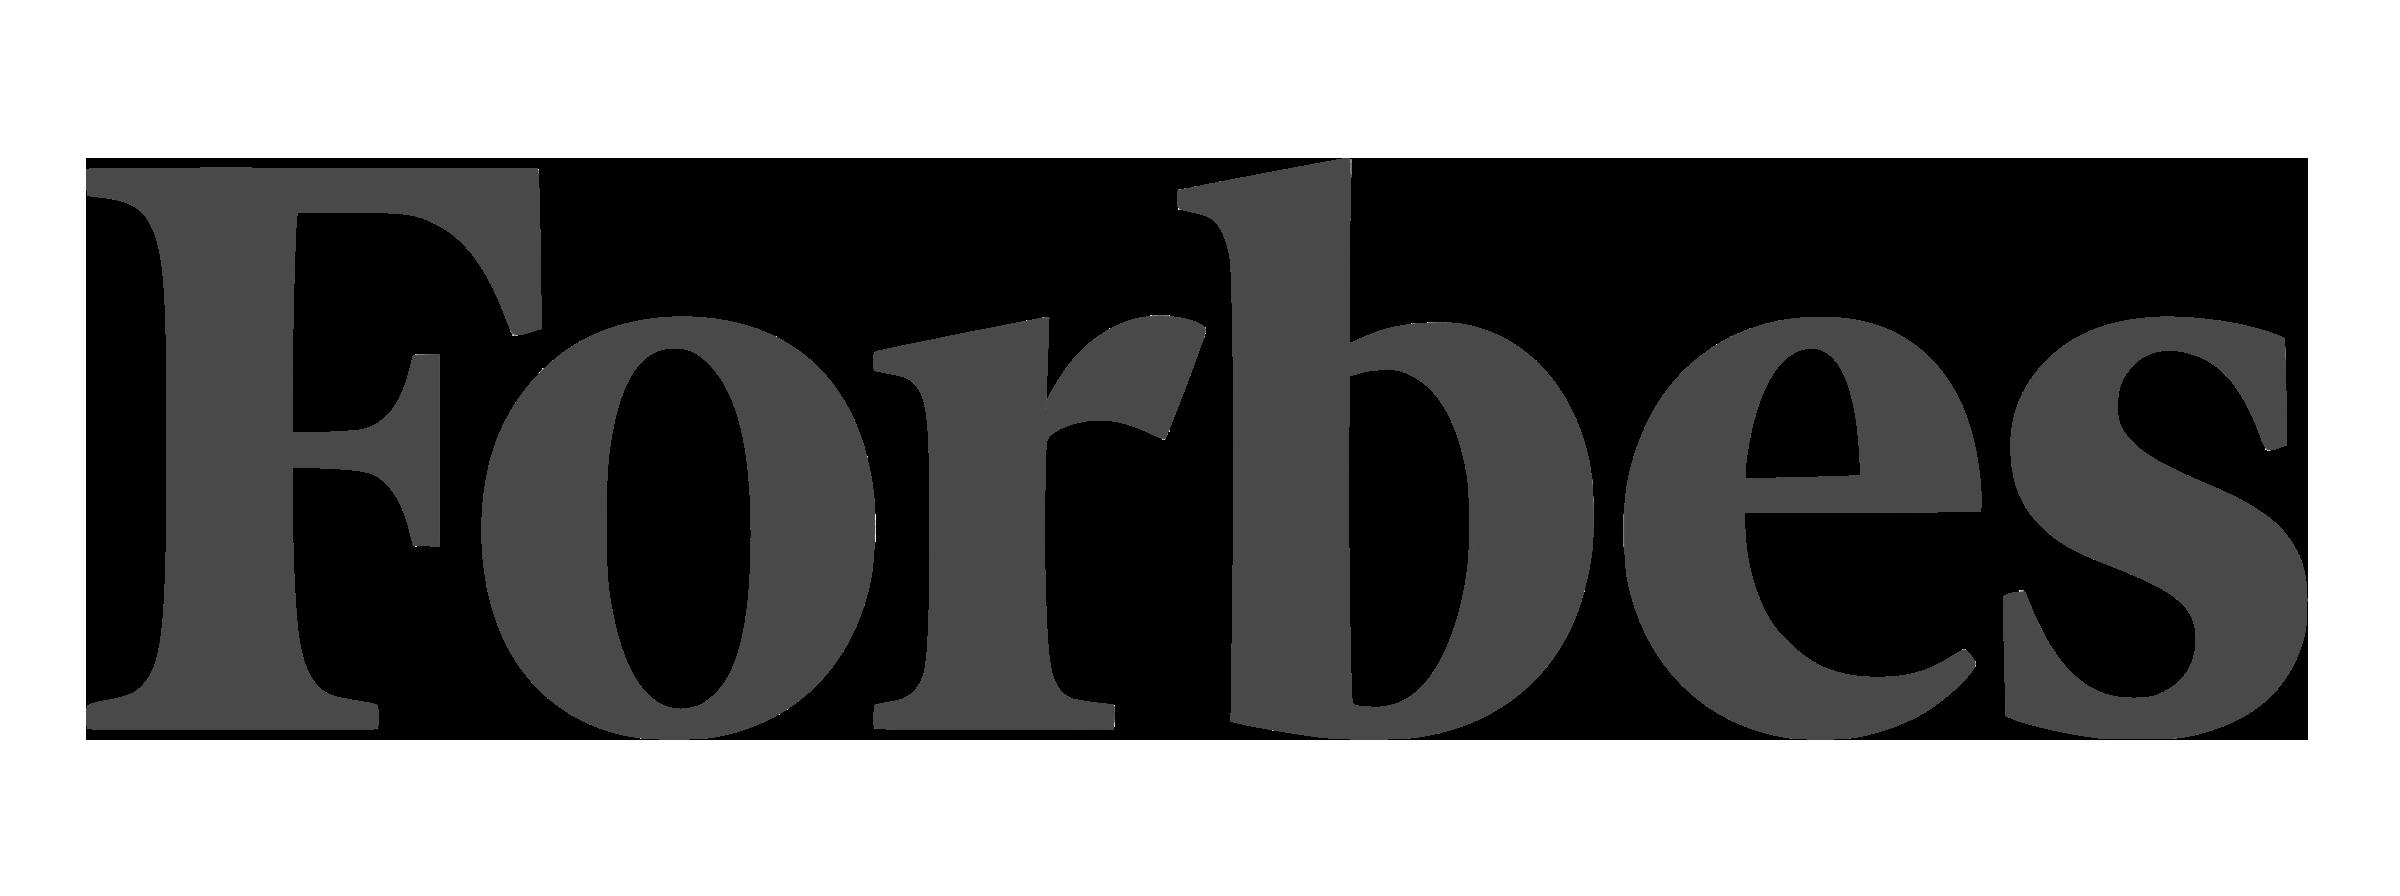 forbes-logo-png-transparent